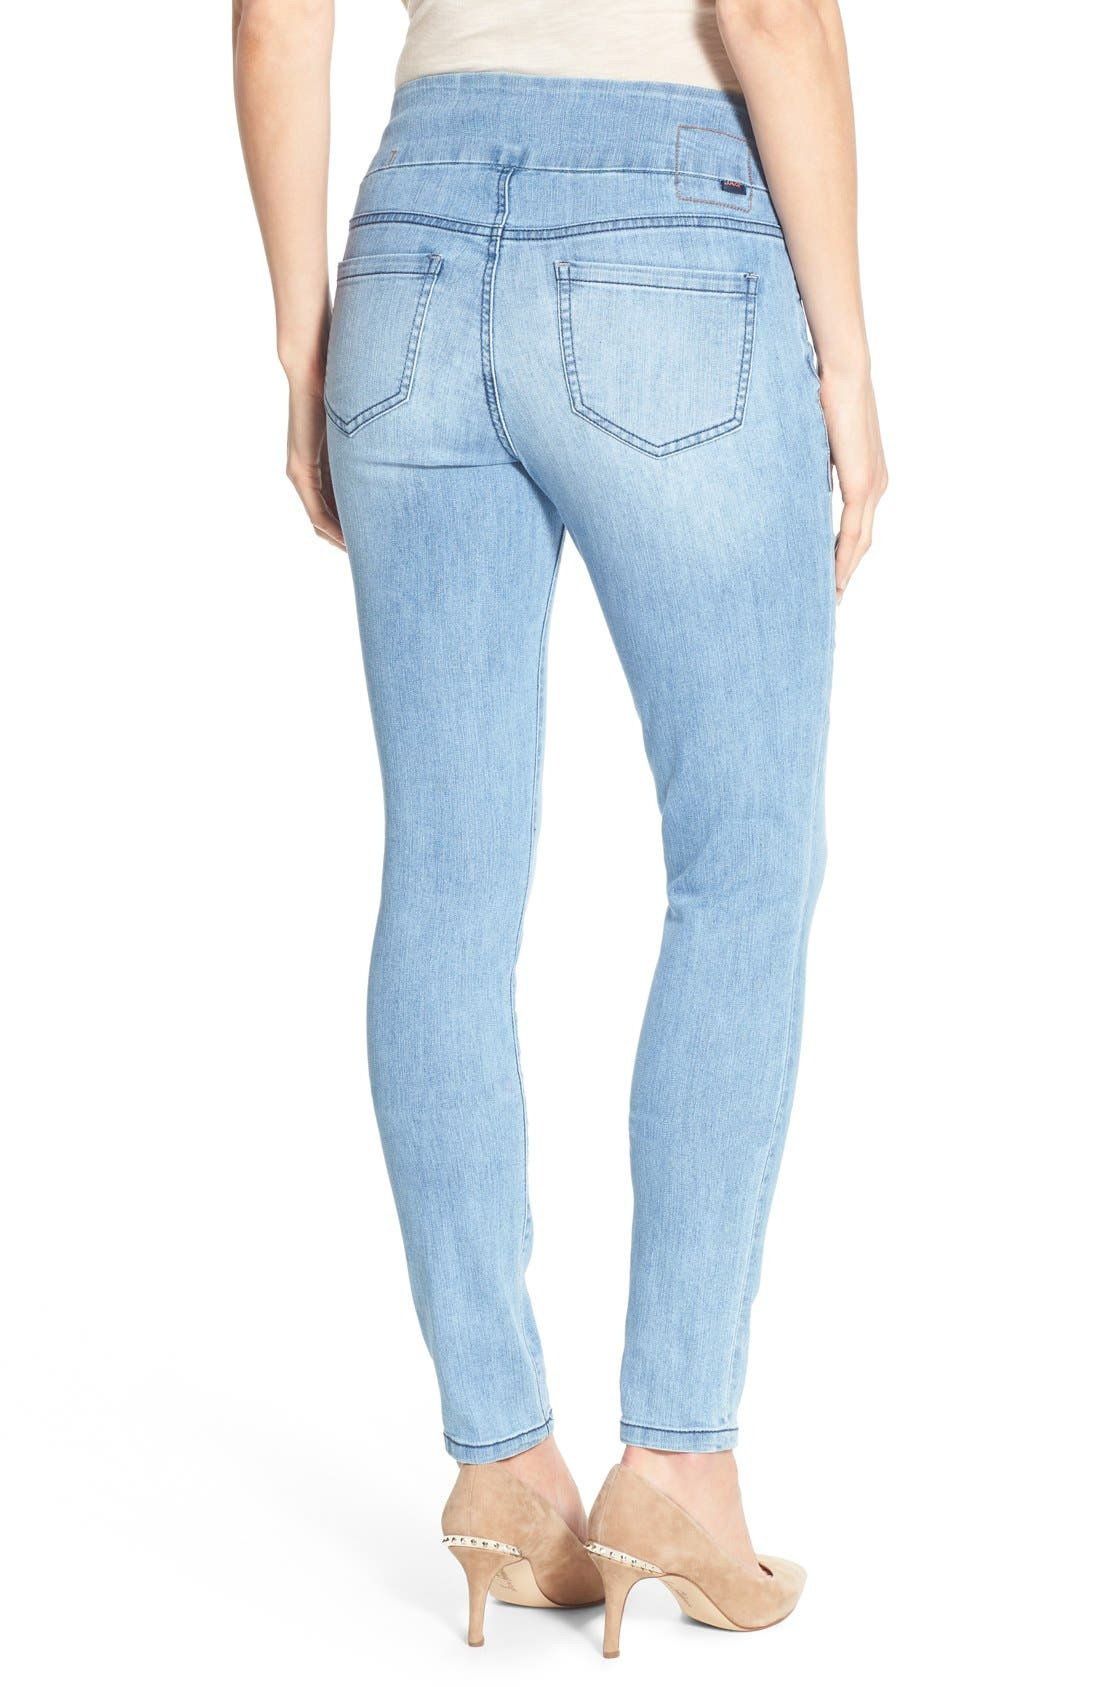 Alternate Image 2  - Jag Jeans 'Nora' Pull-On Stretch Skinny Jeans (Southern Sky)